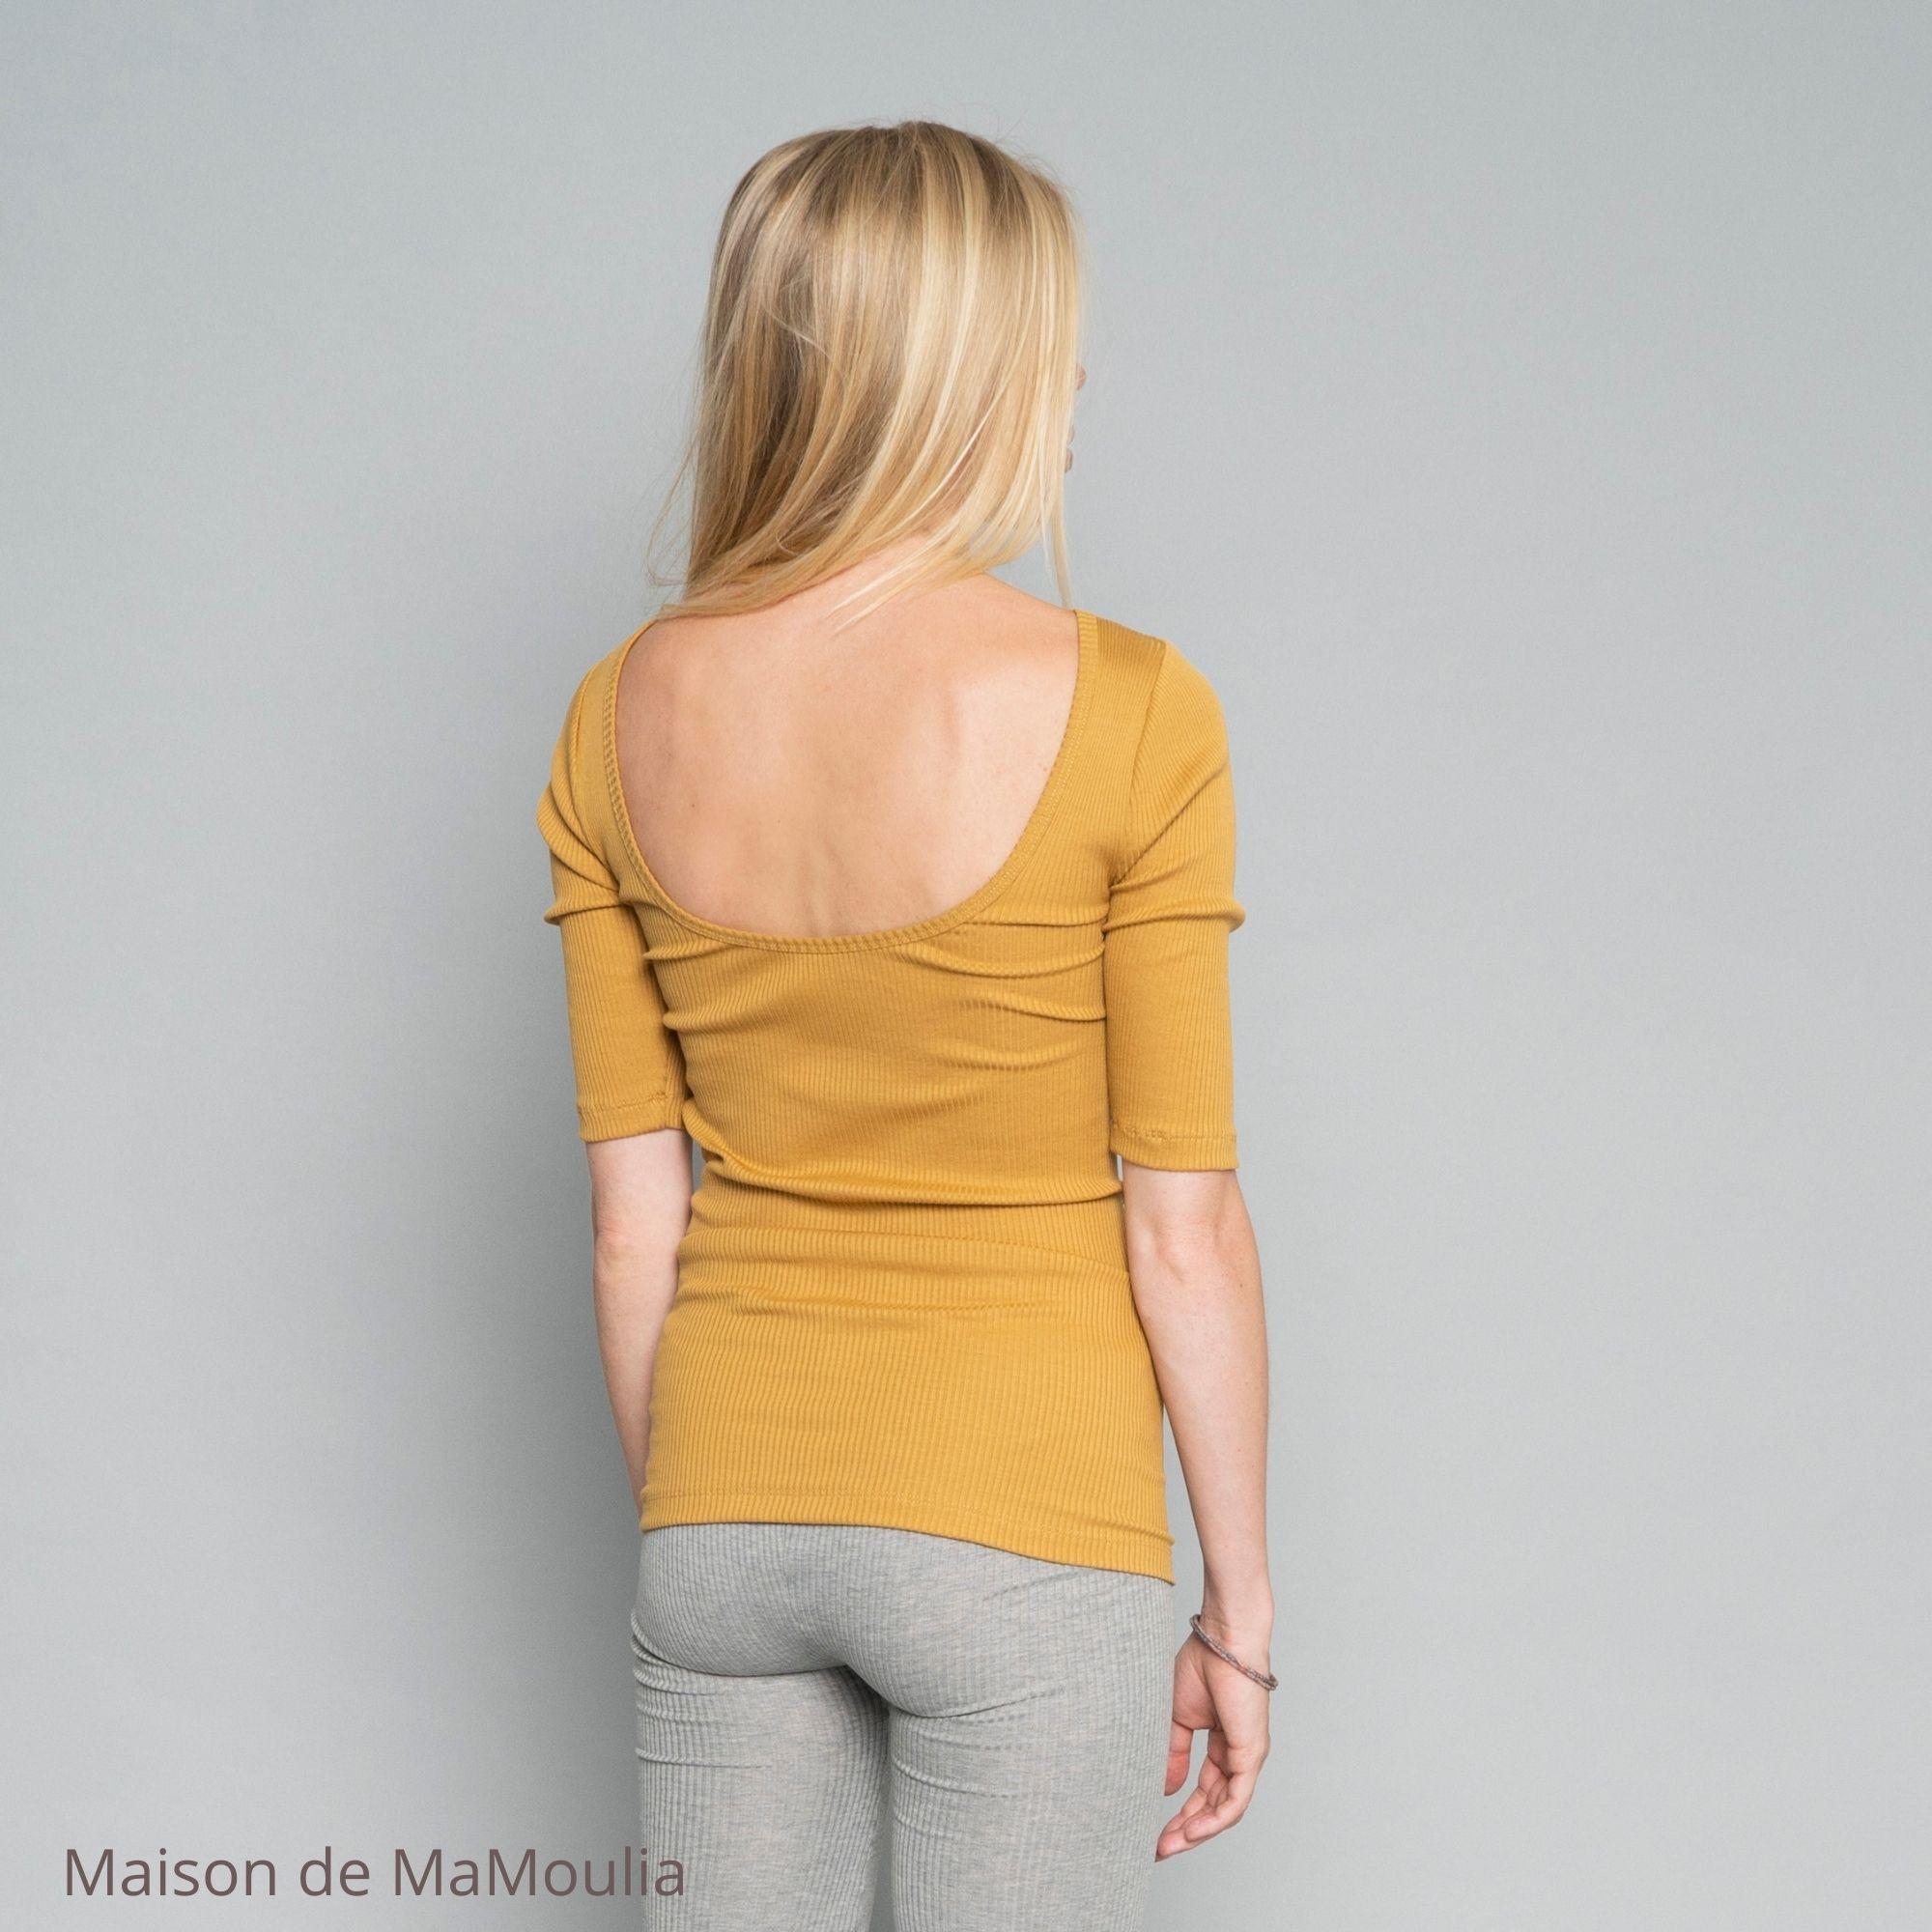 MINIMALISMA - Top - manches 3/4 - Soie 70%/coton 30%- Golden leaf